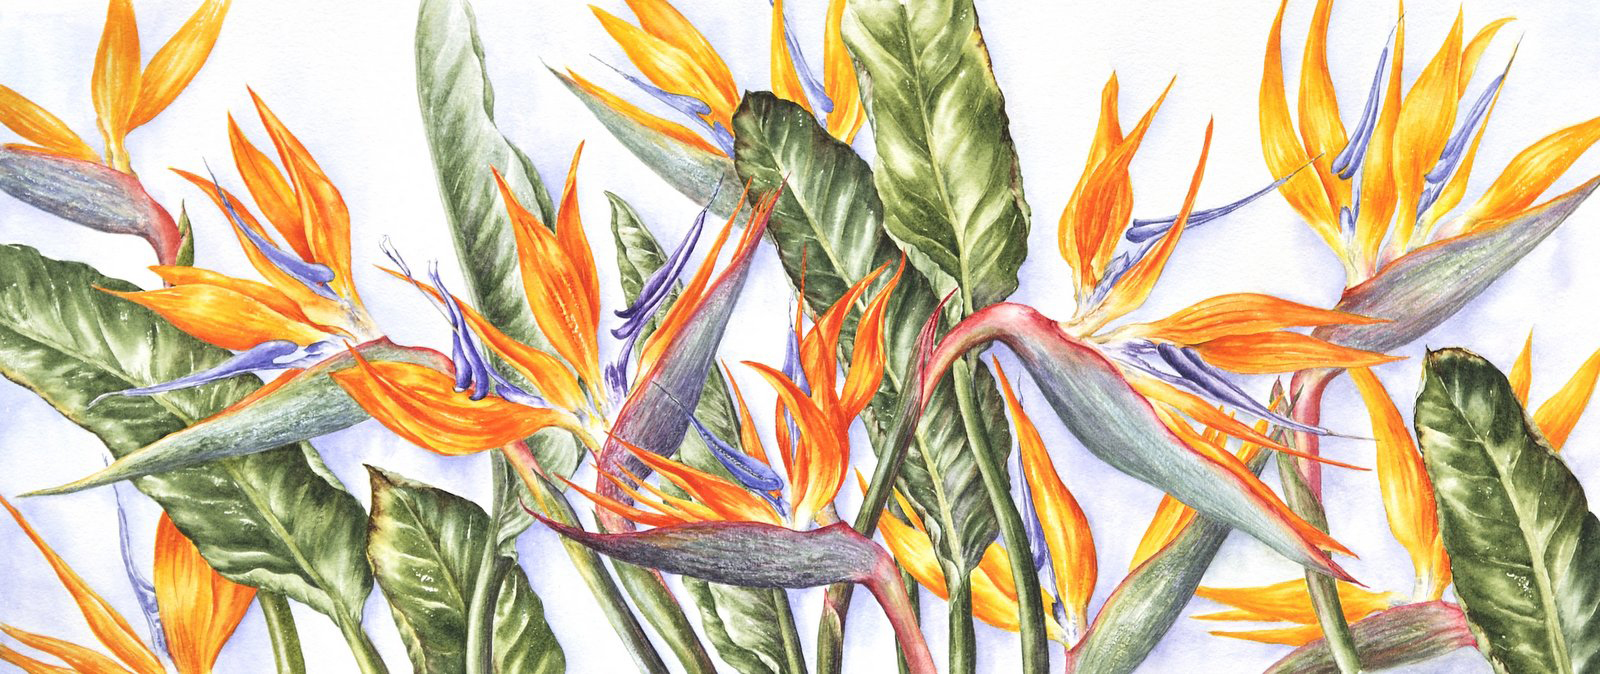 Sandra Summers | Strelitzias | Watercolour | 94x57cm | £700